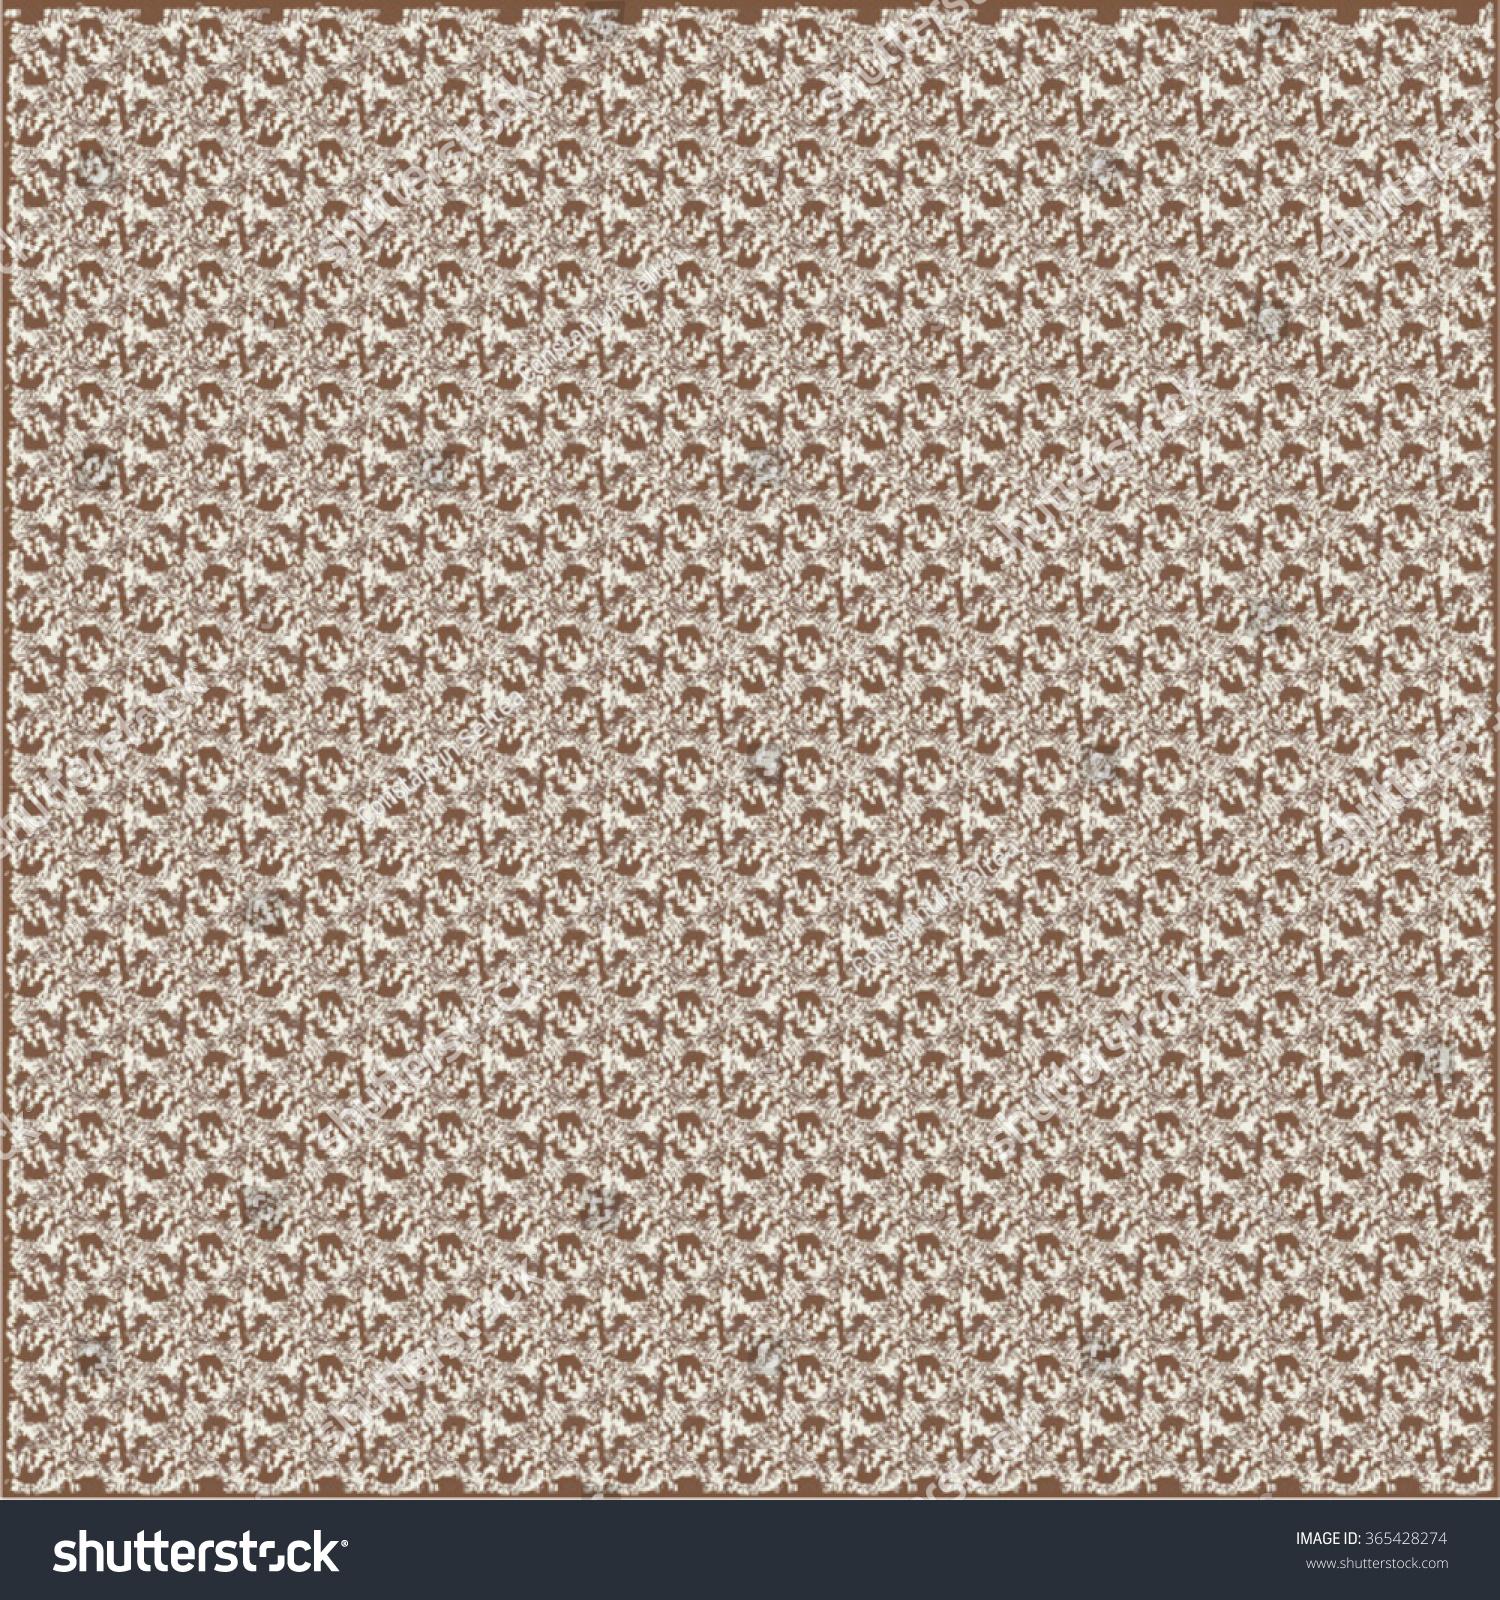 Embroidery texture makaroka